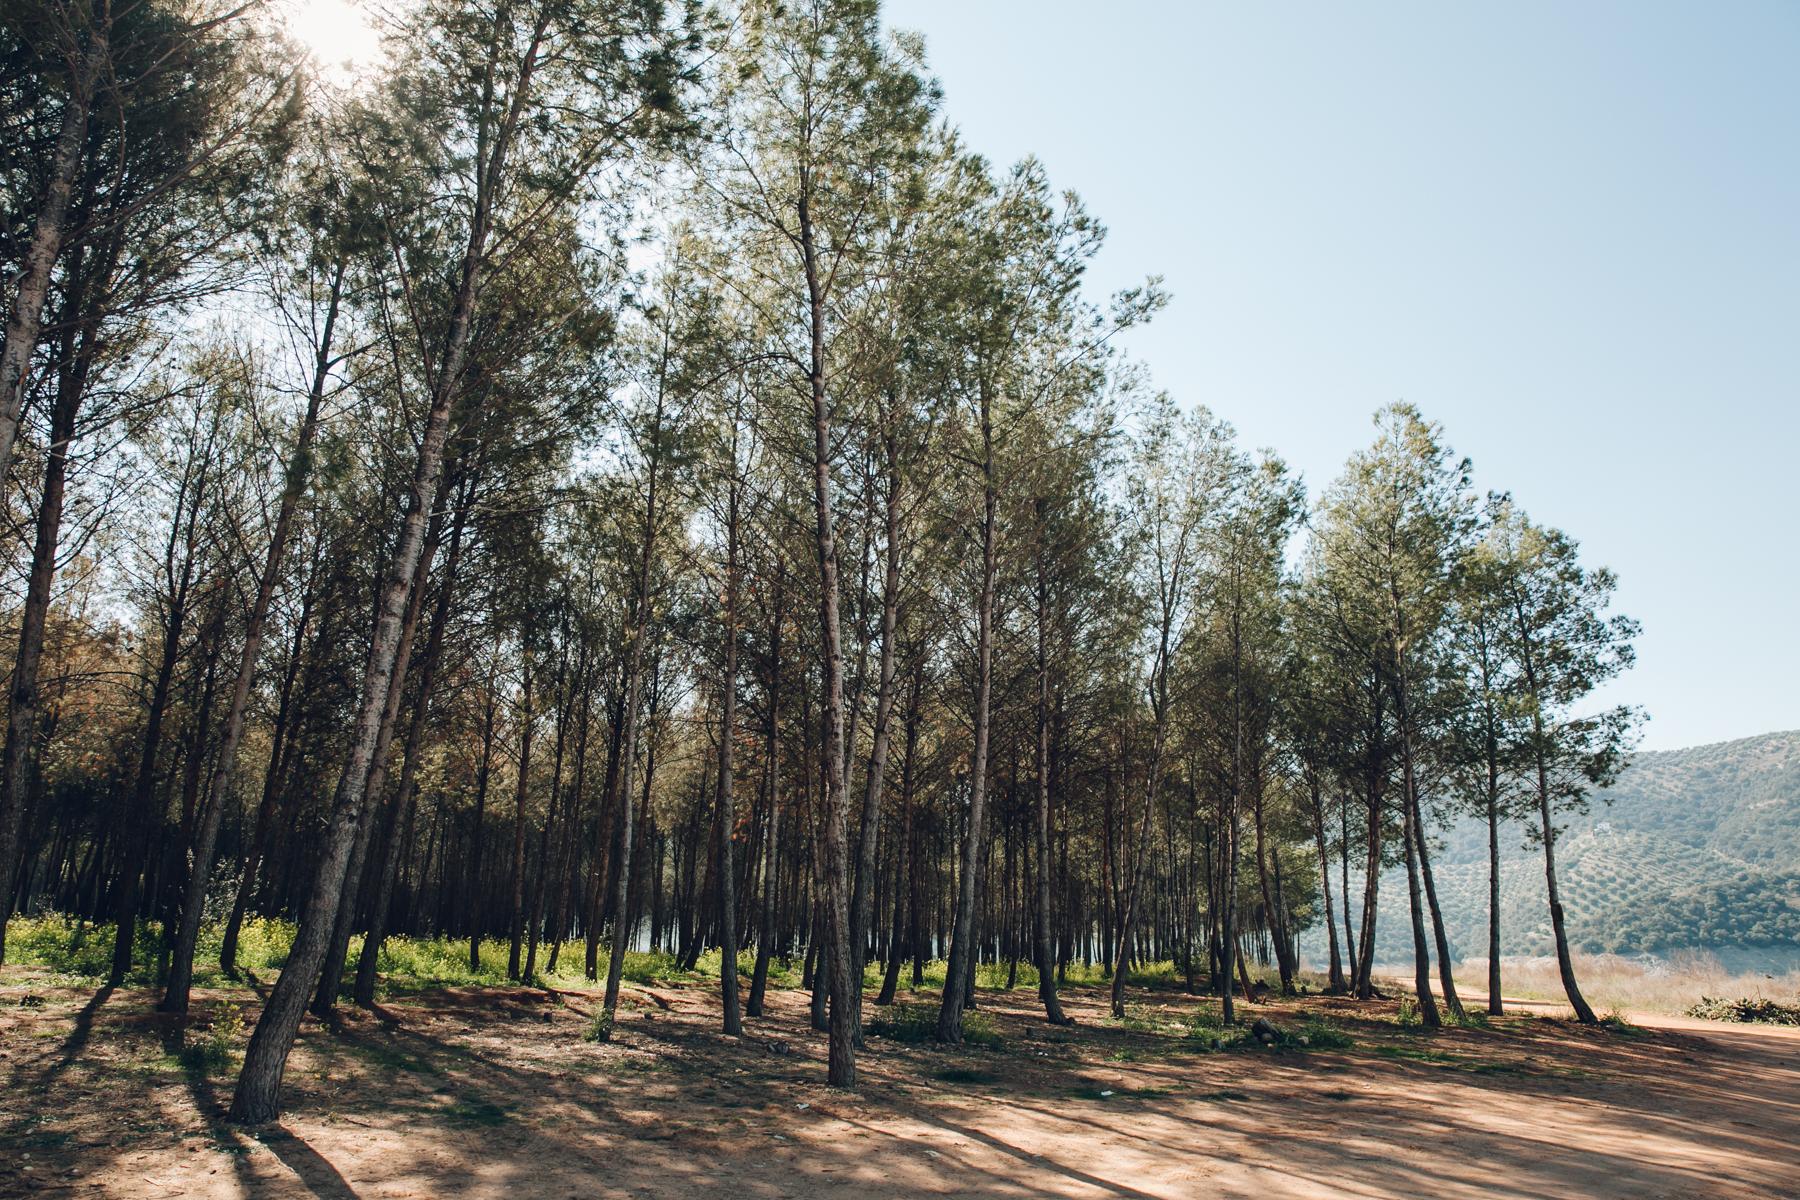 Pine woods on Valdearenas Beach near Lake Iznajar in Andalusia.